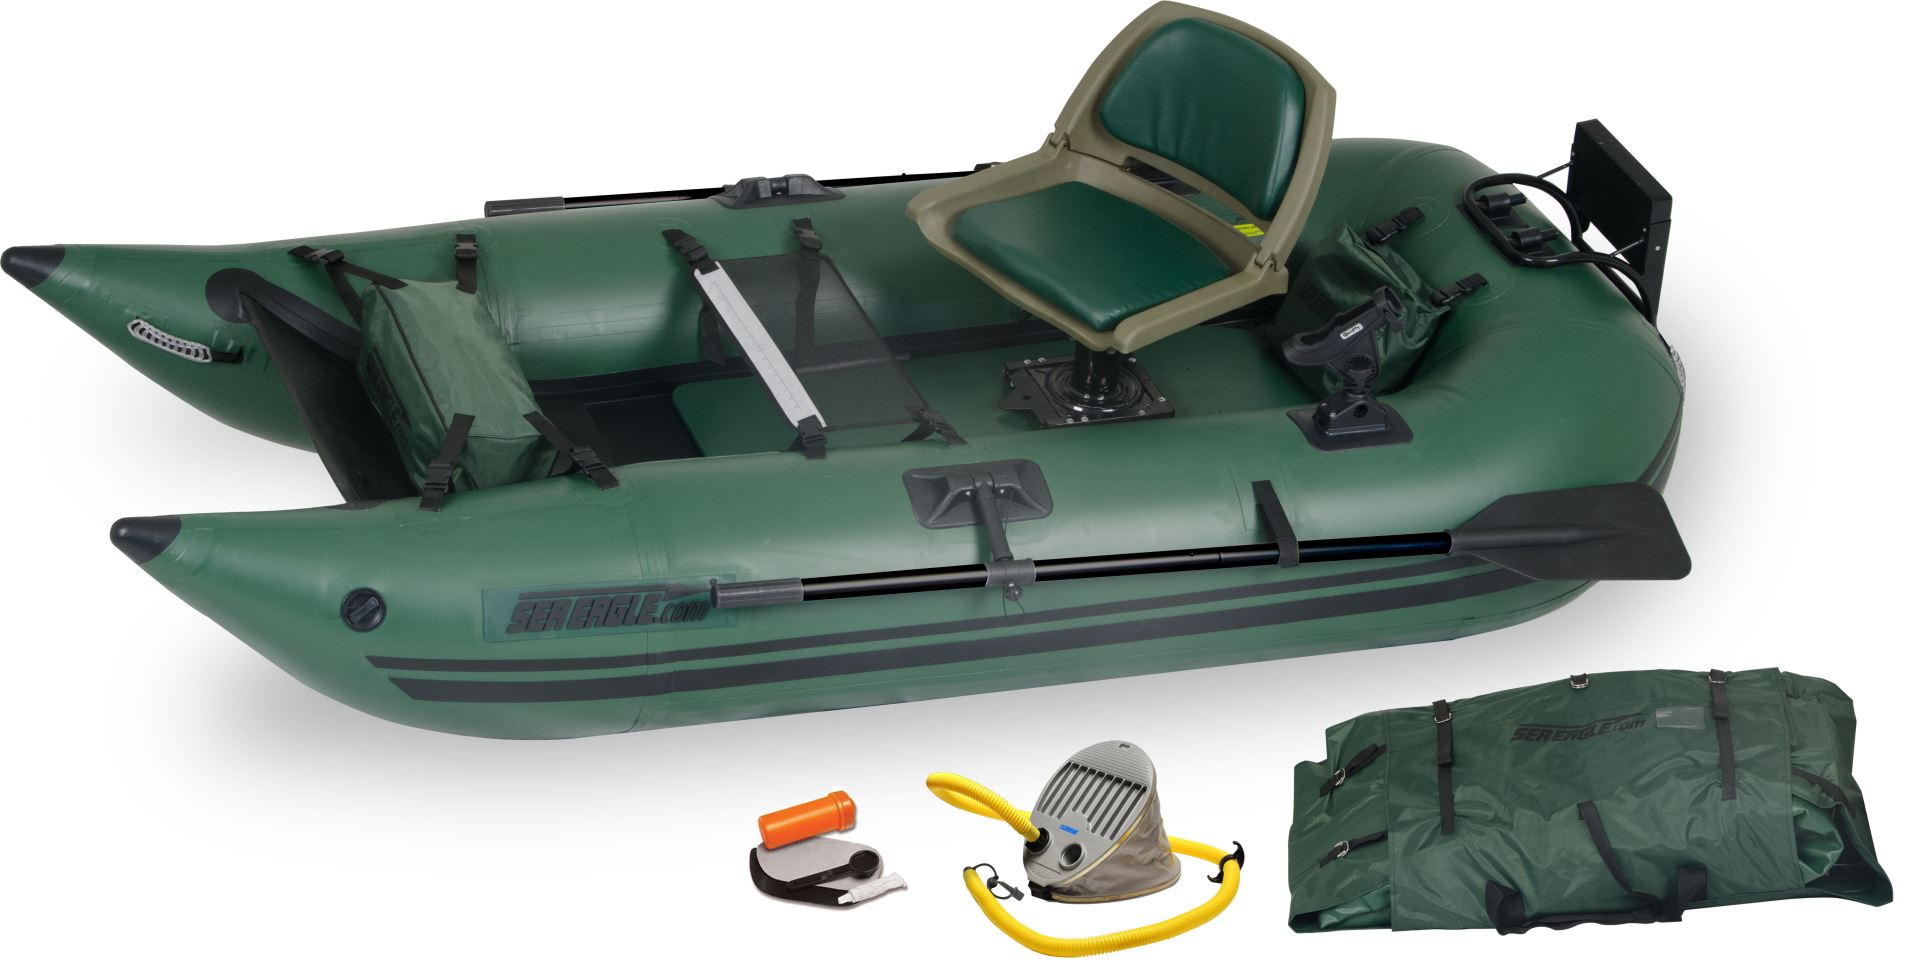 Sea Eagle 285fpb 1 Person Inflatable Fishing Boats